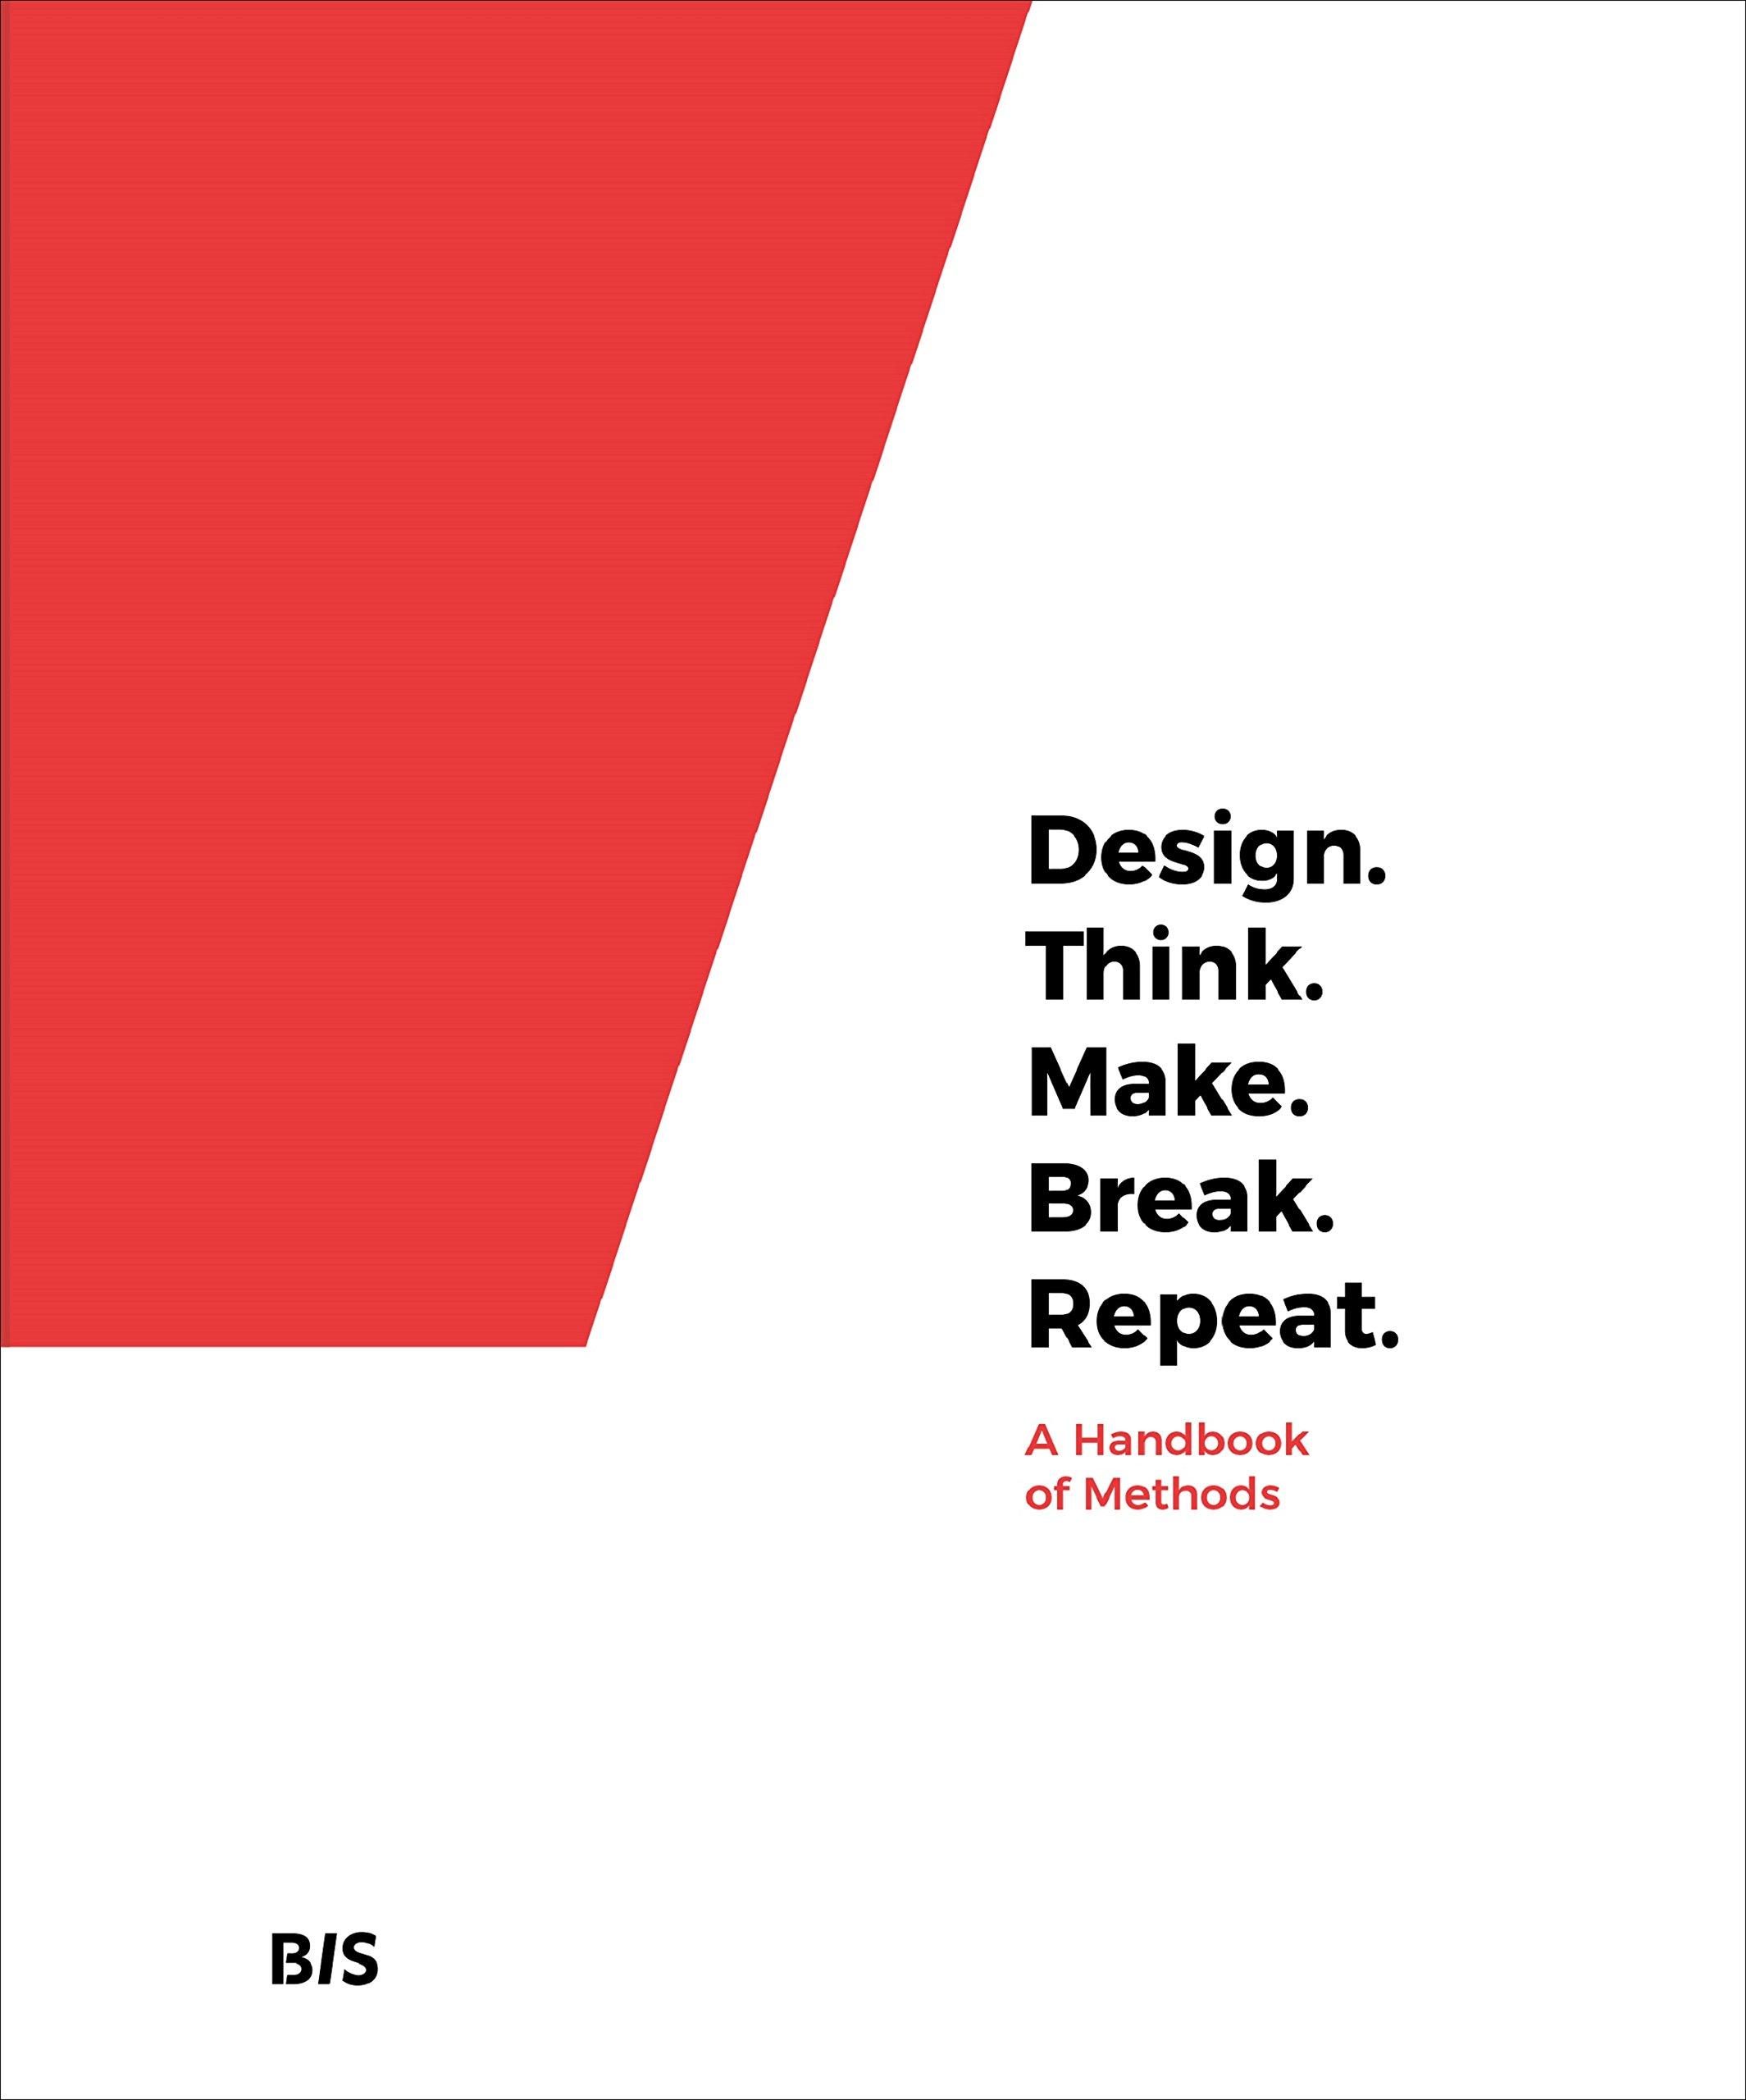 Design. Think. Make. Break. Repeat.: A Handbook of Methods